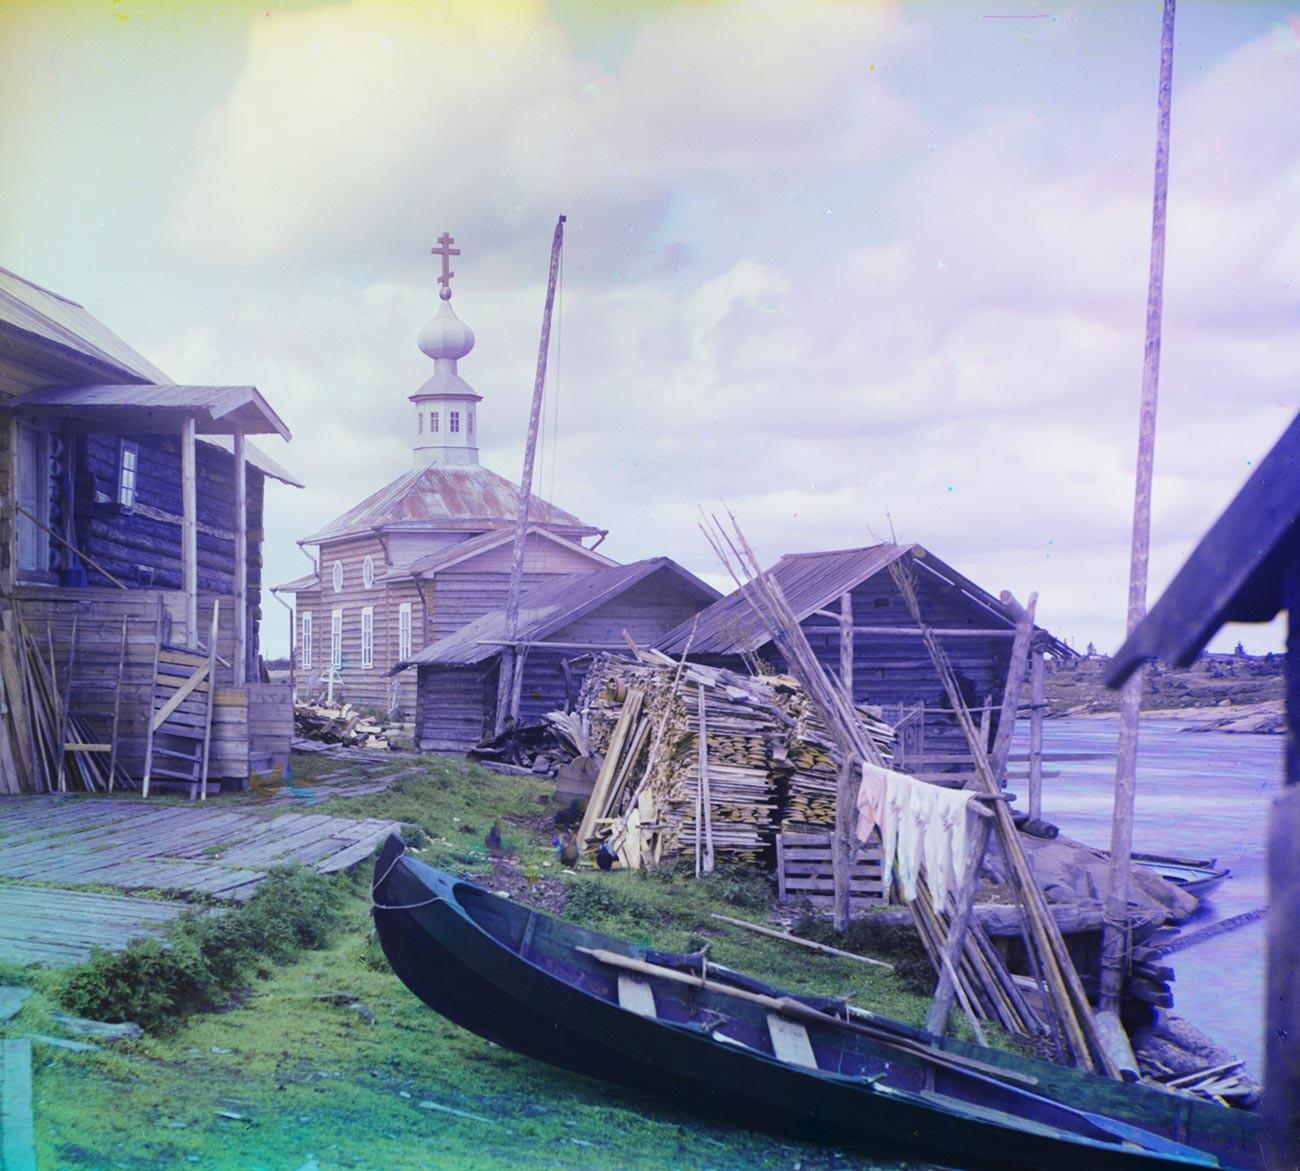 Soroka village (now Belomorsk). House overlooking Vyg River, with skiff, firewood & log sheds. Background: Church of Sts. Zosima & Savvaty. Summer 1916